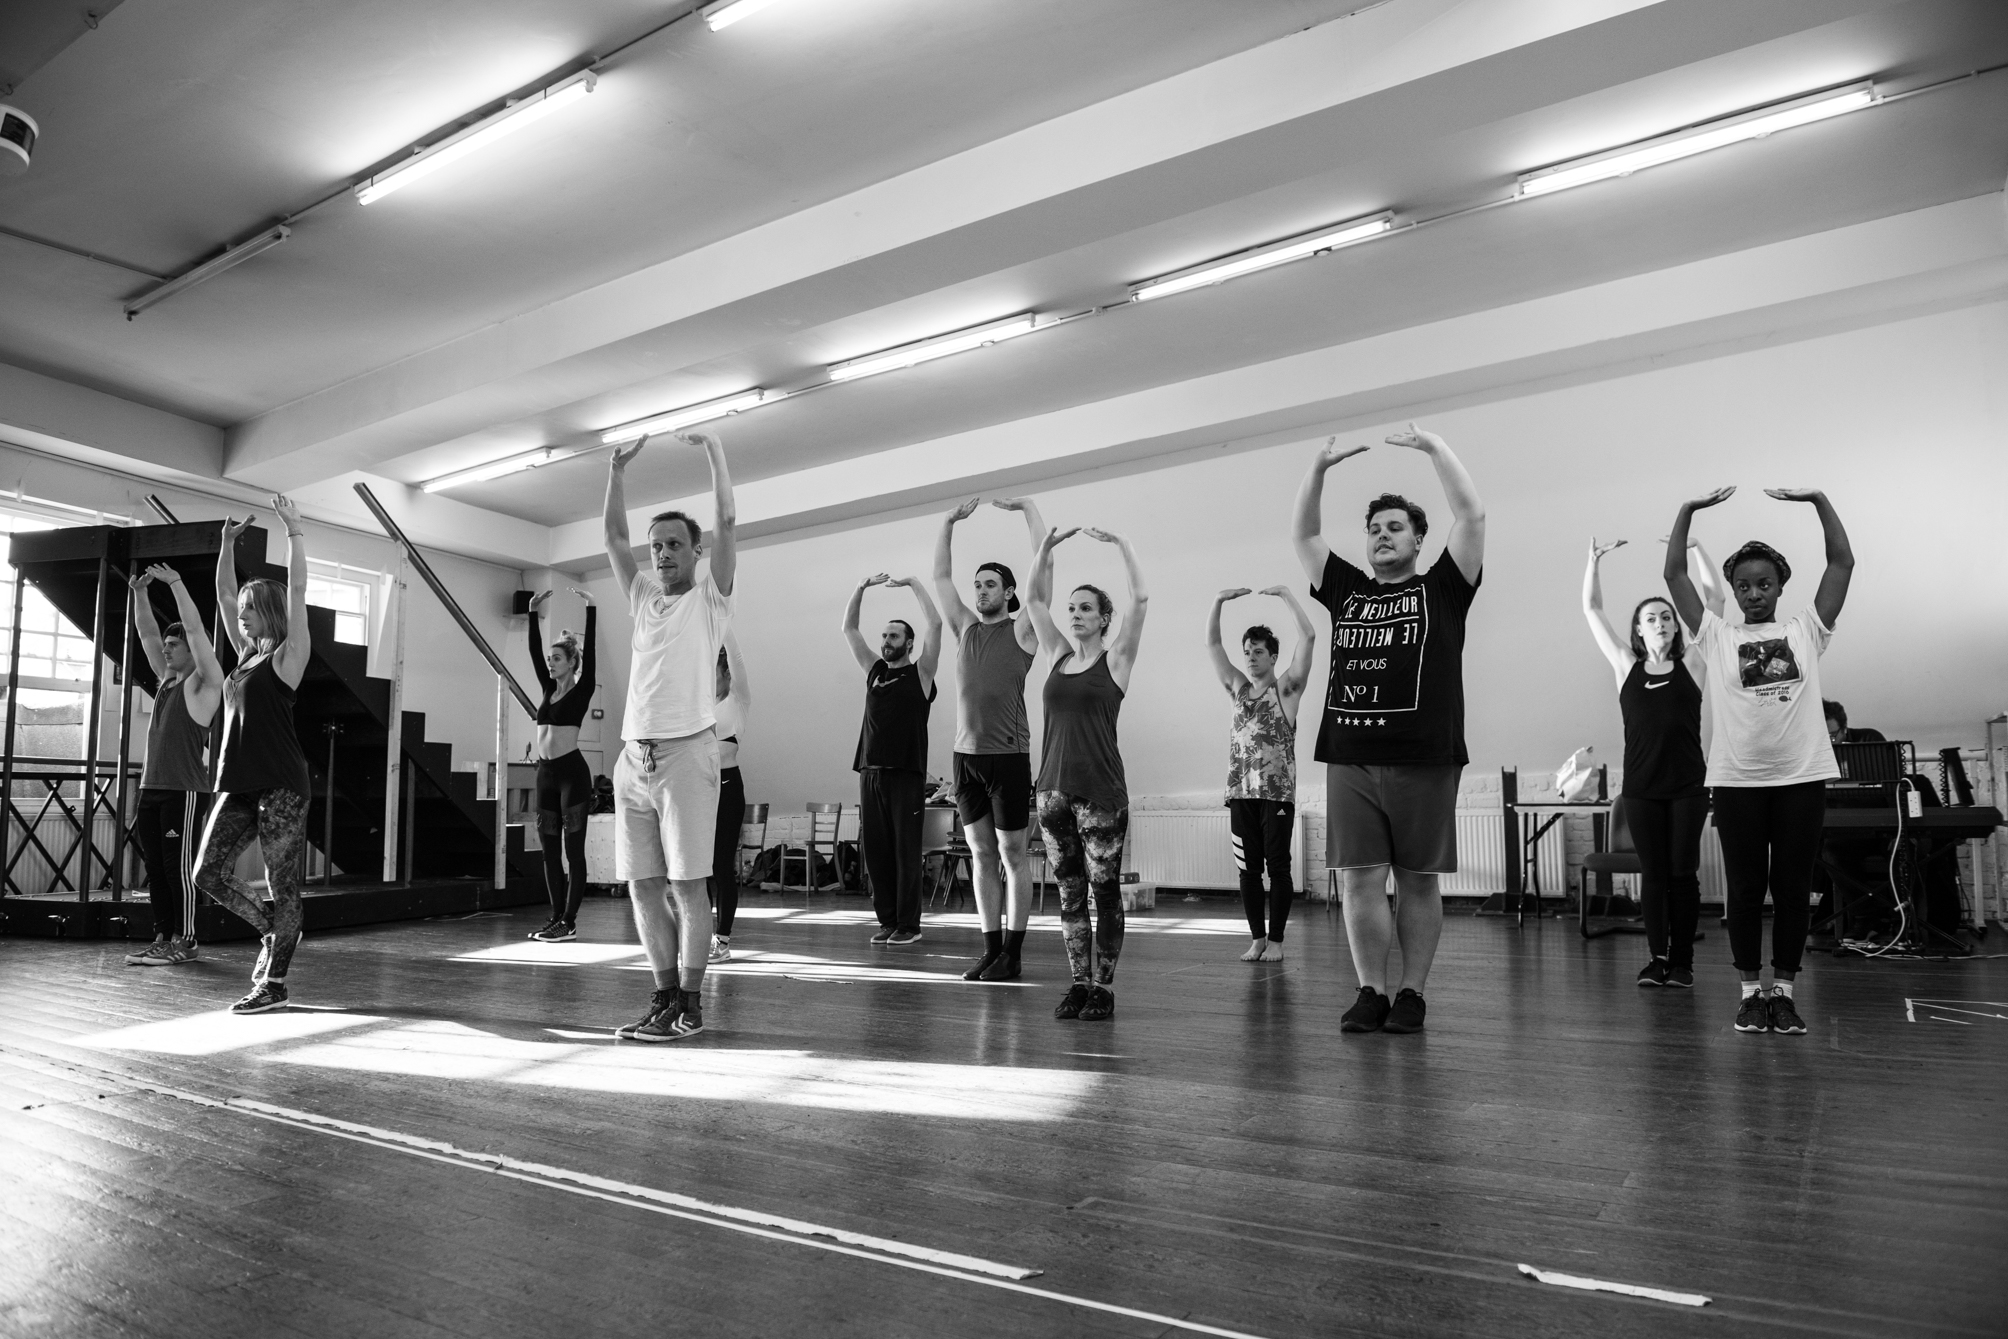 addams-family-rehearsals_credit-craig-sugden-3